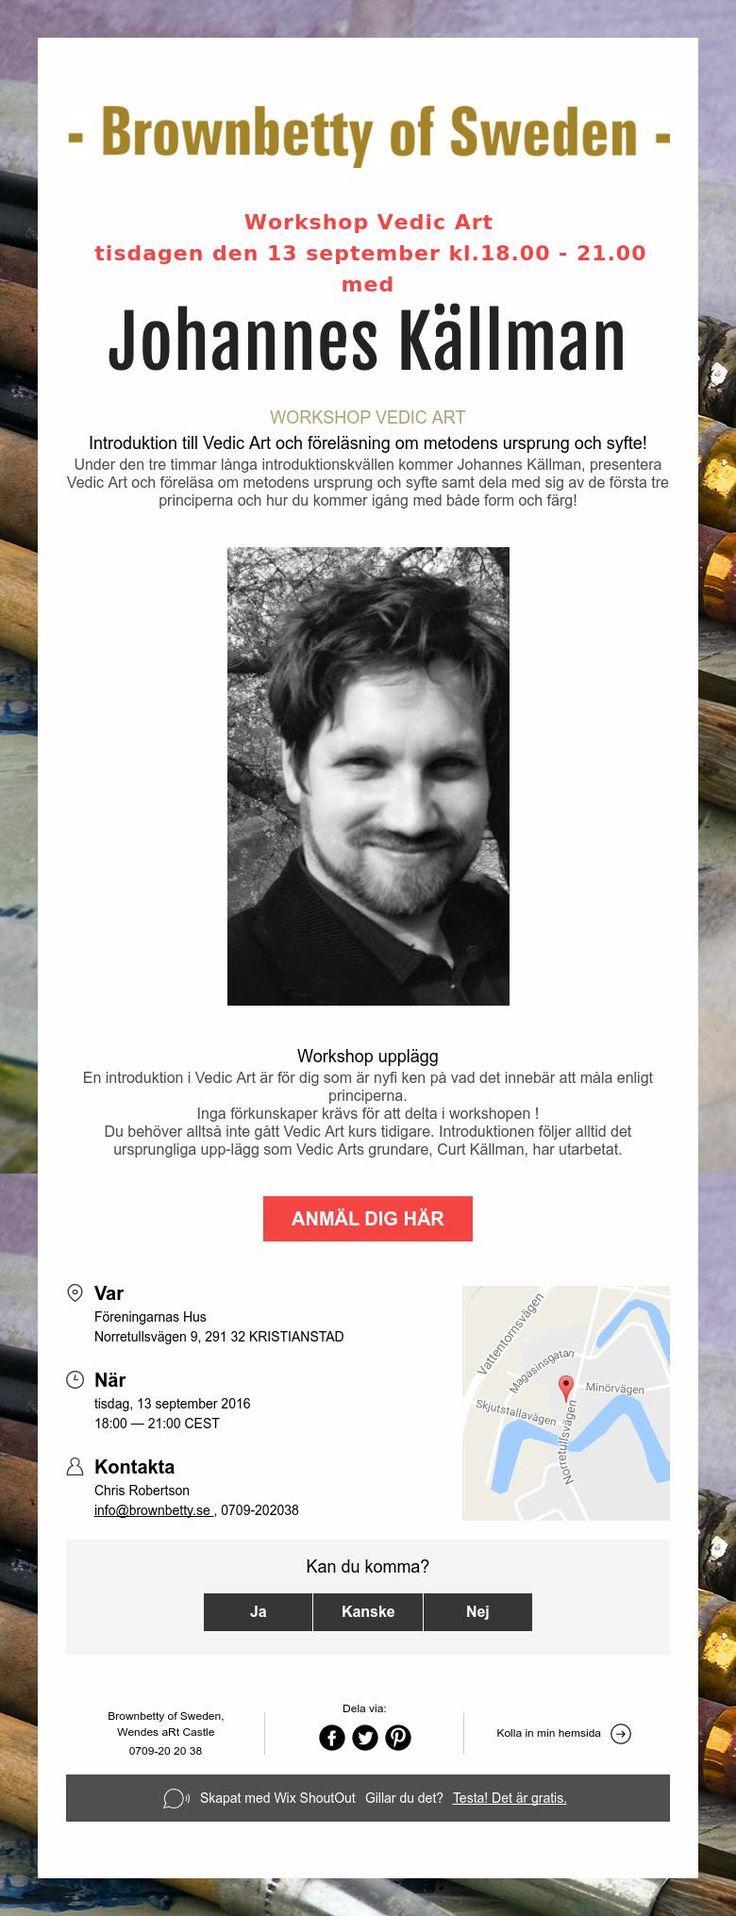 Workshop Vedic Art  tisdagen den 13 september kl.18.00 - 21.00  med  Johannes Källman